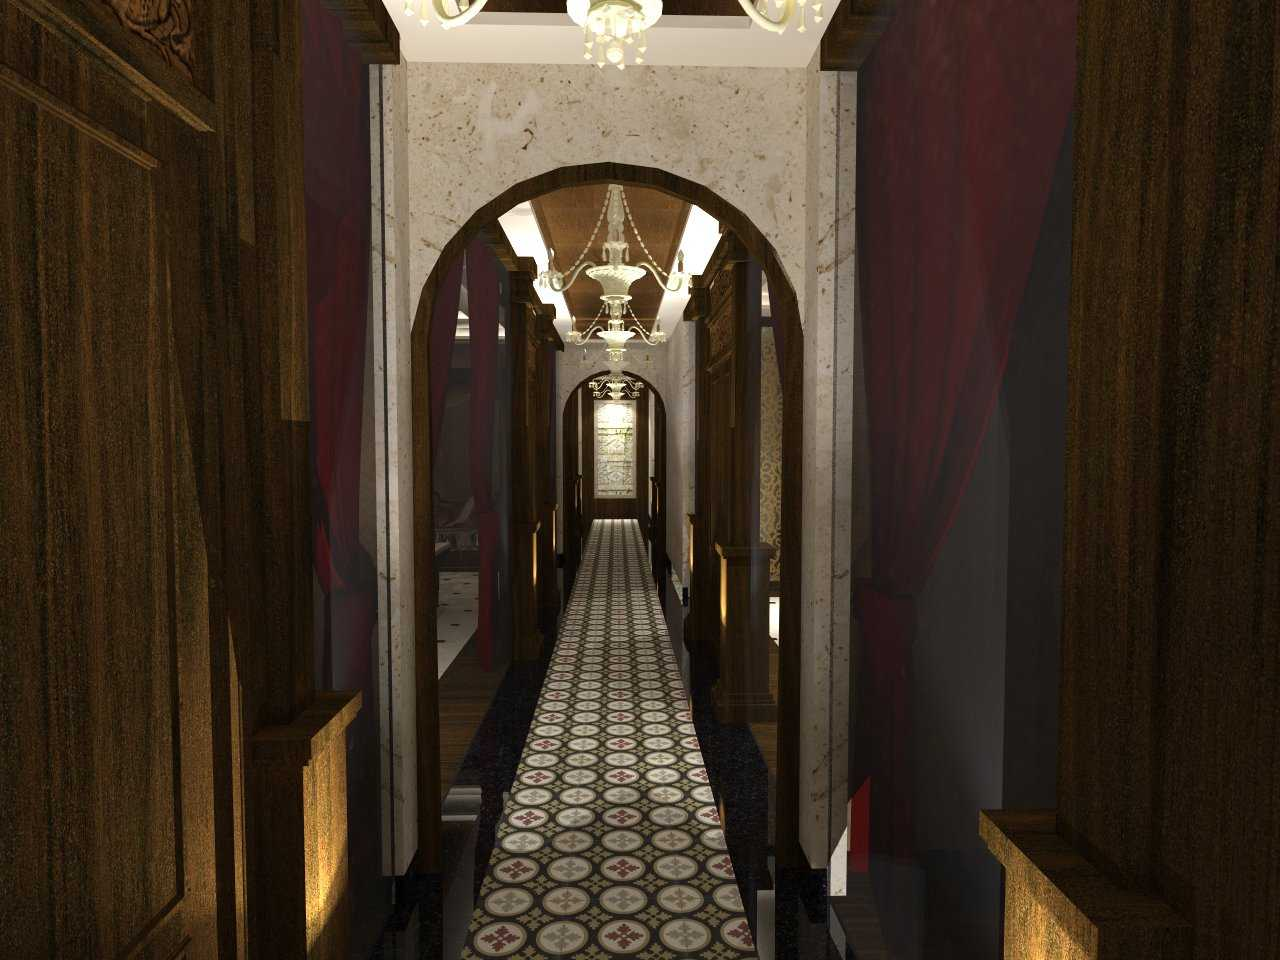 Tms Creative Taman Sari Royal Heritage Spa In Prague, Czech Republic Prague 1, Ceko Jakarta Hallway-View-B-Final-02 Tradisional  12392